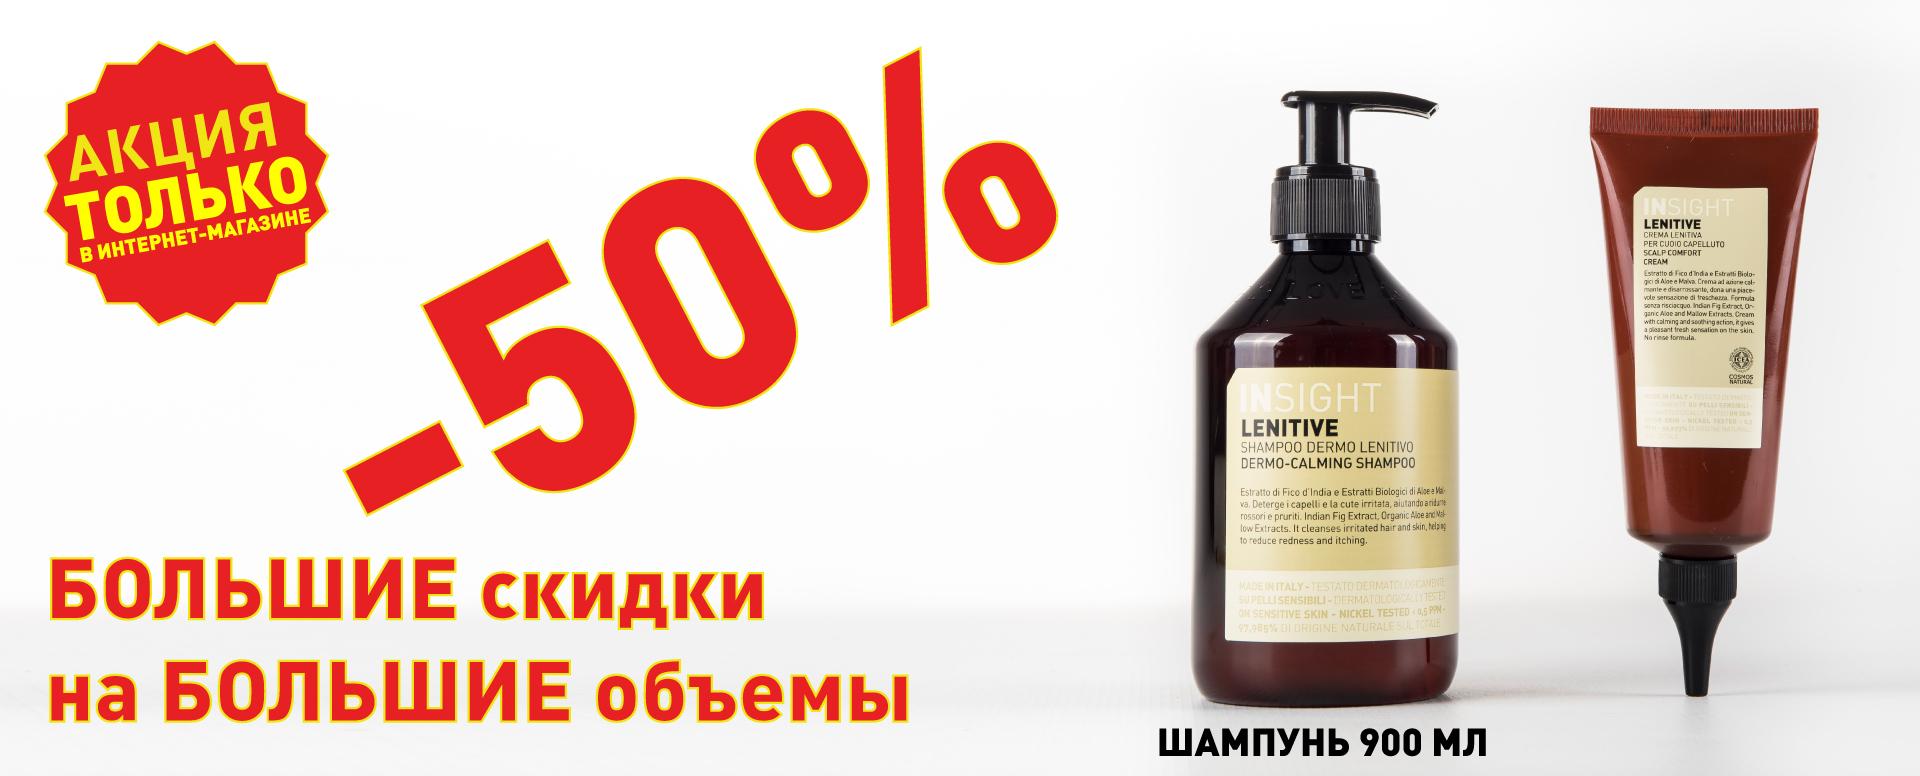 Promo Lenitive